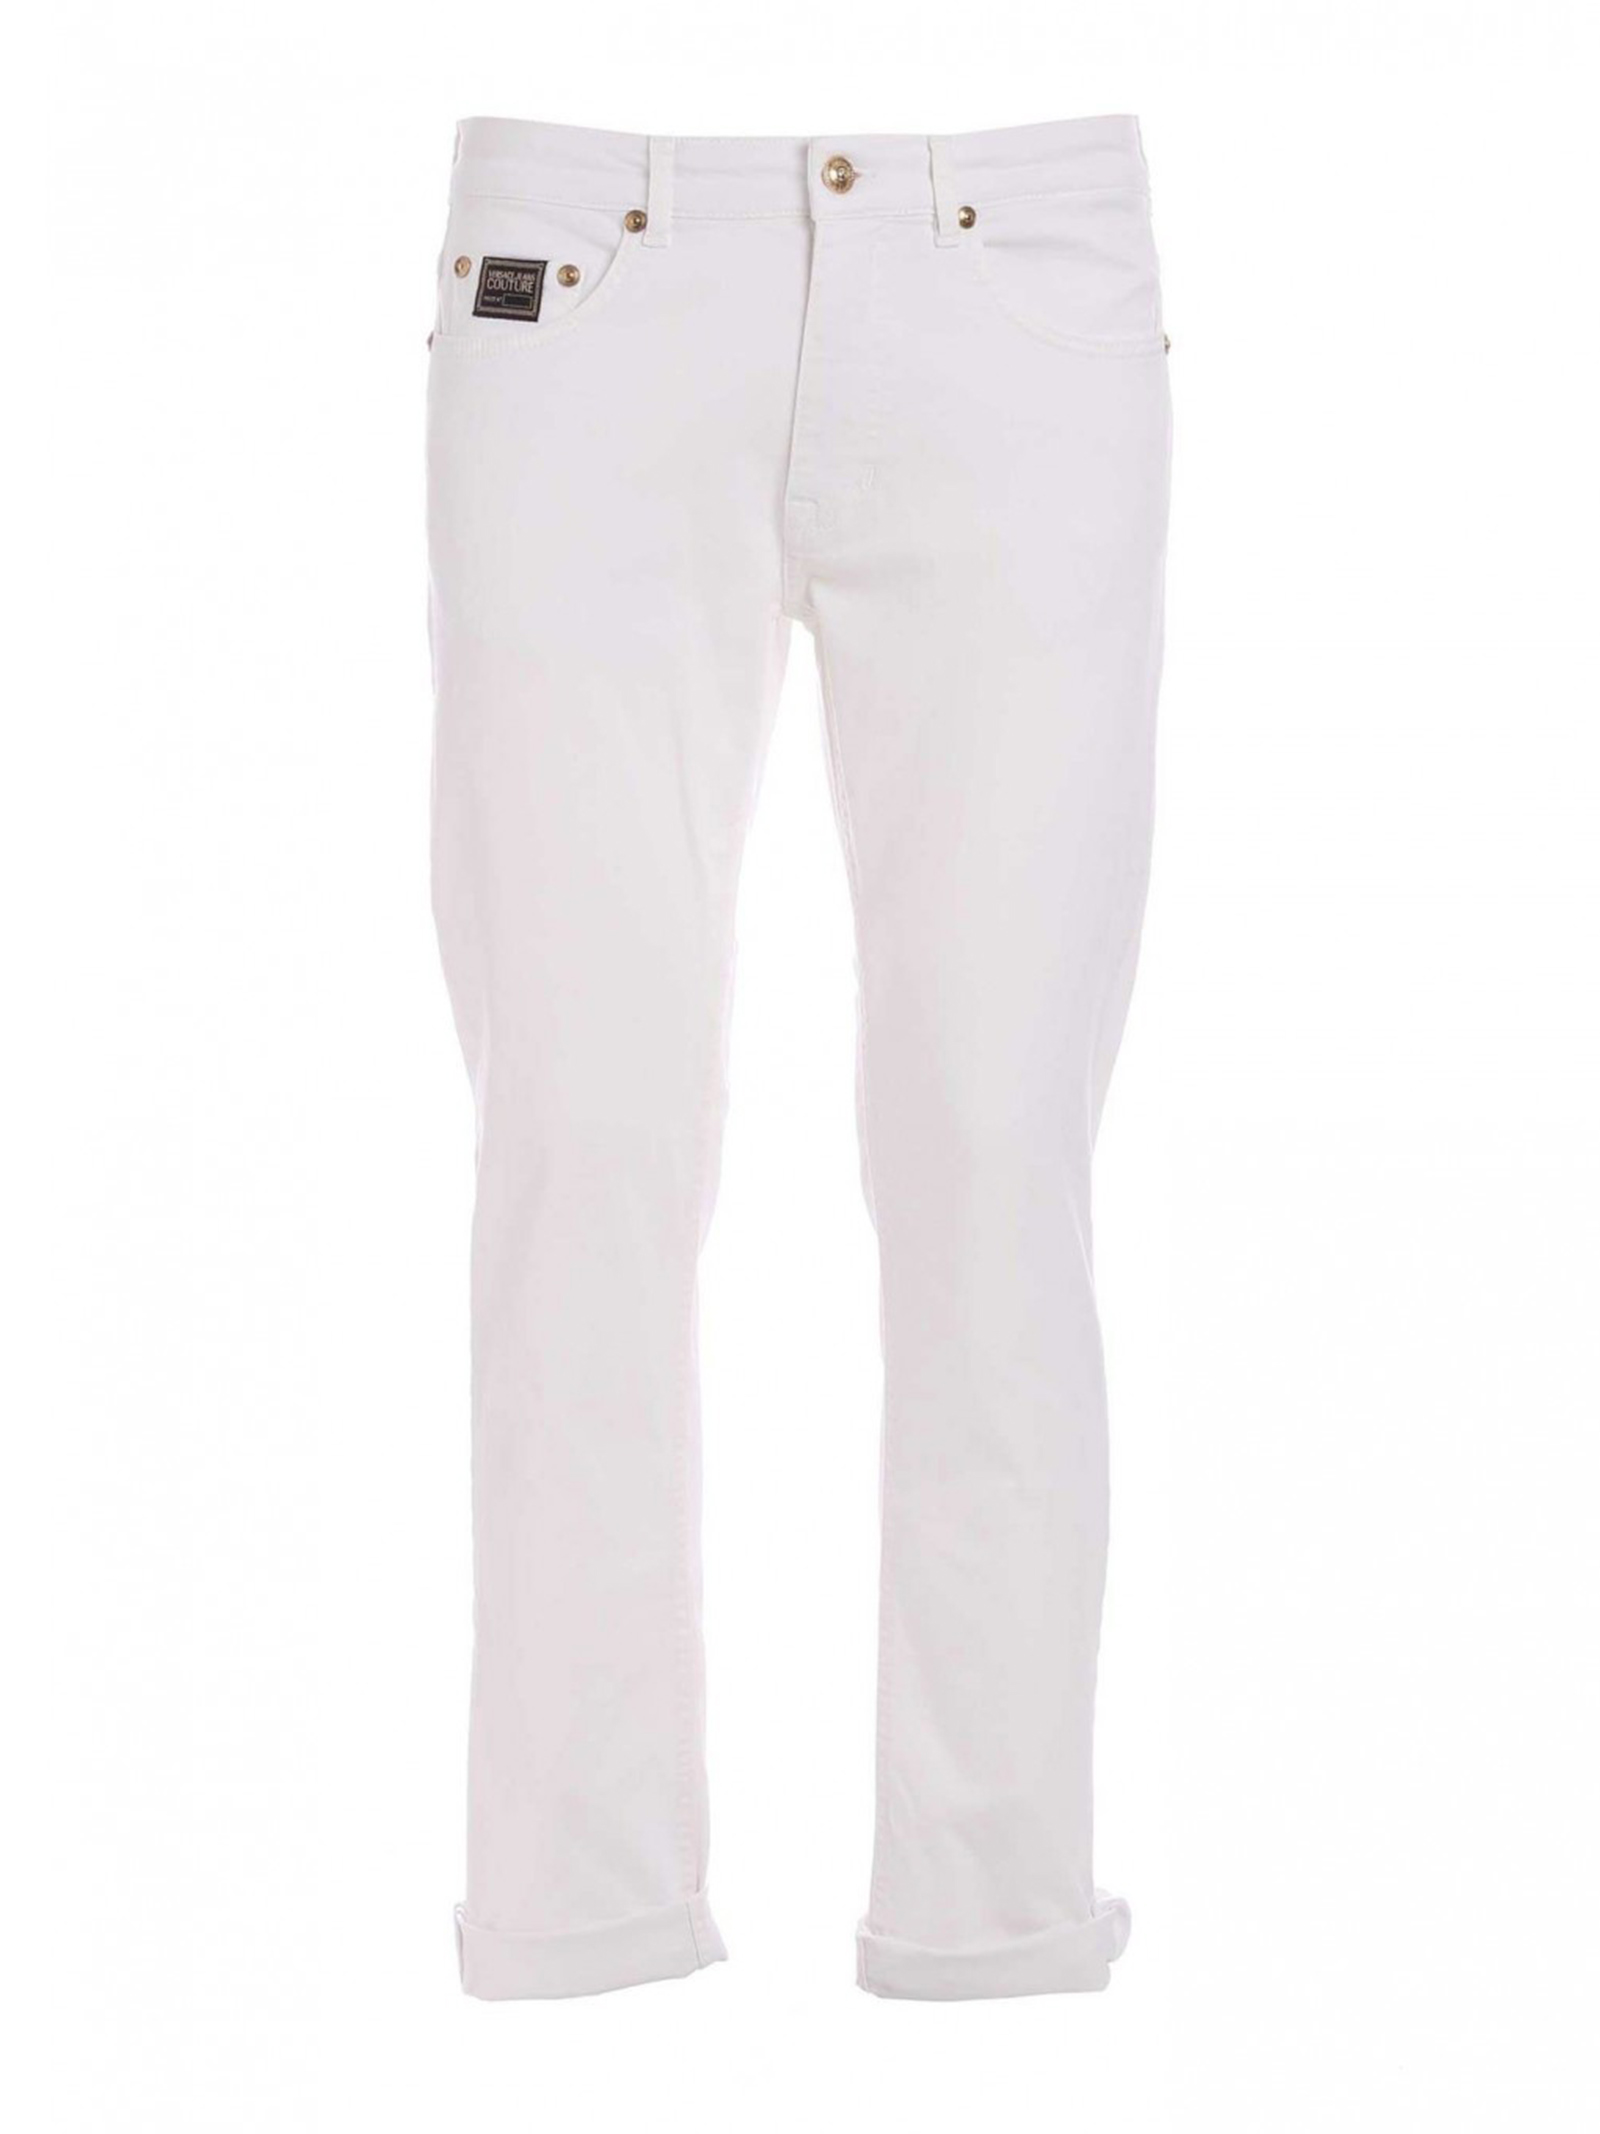 Jeans Regular Fit VERSACE JEANS   Pantalone   A2 GWA0S560501 003